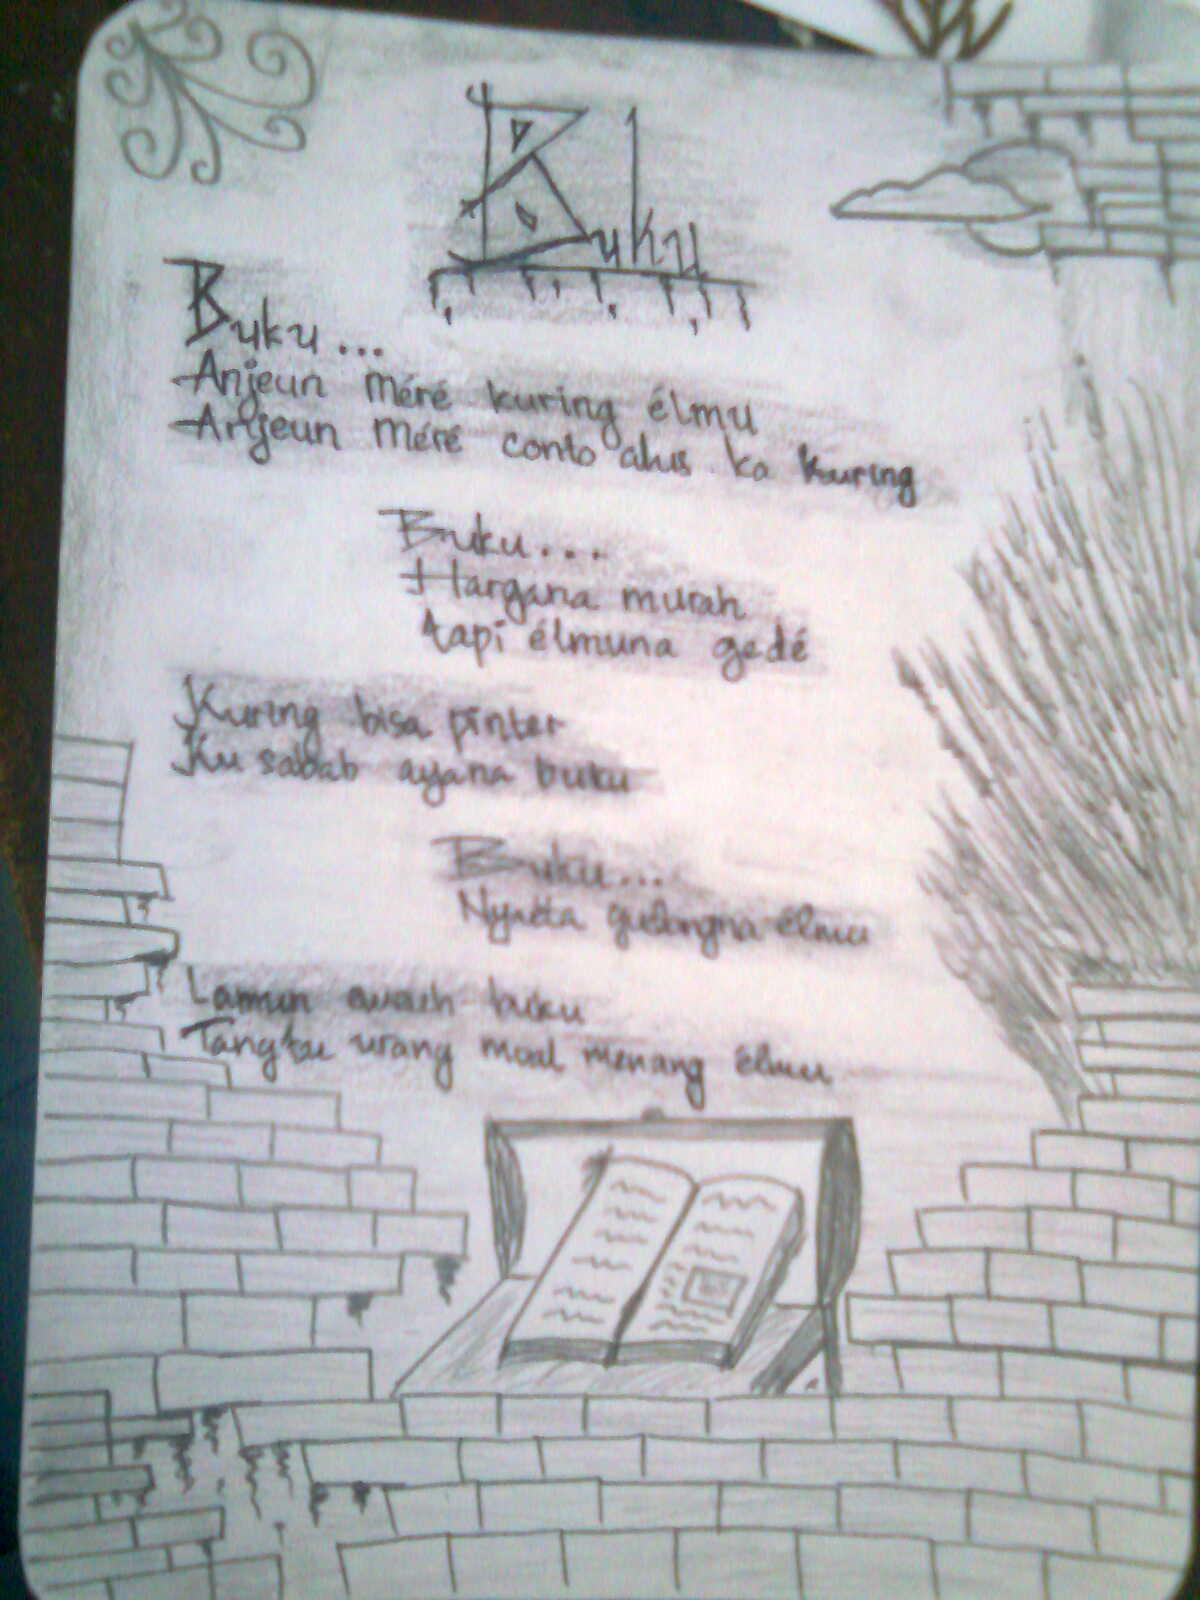 punya ilham uho judulnya buku punya assais judulnya tasik baheula